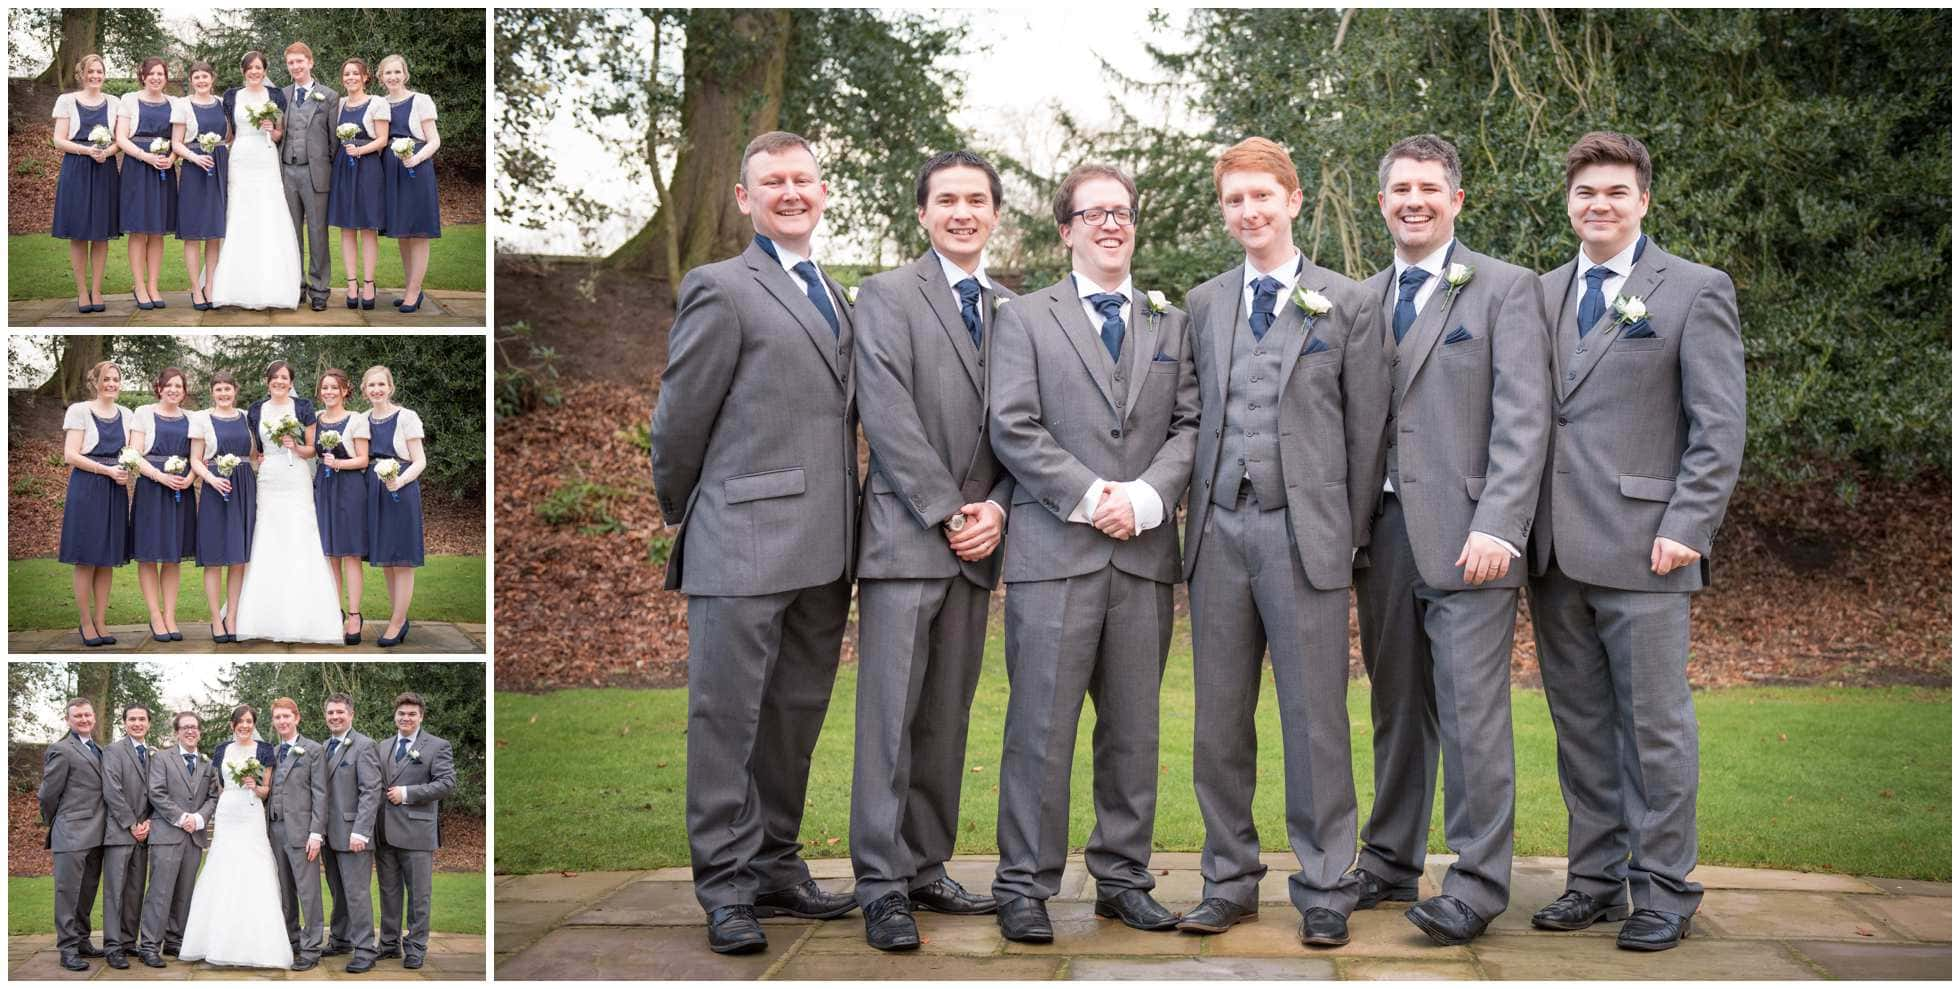 The groom and his groomsmen Marriott Hotel York Wedding Photography